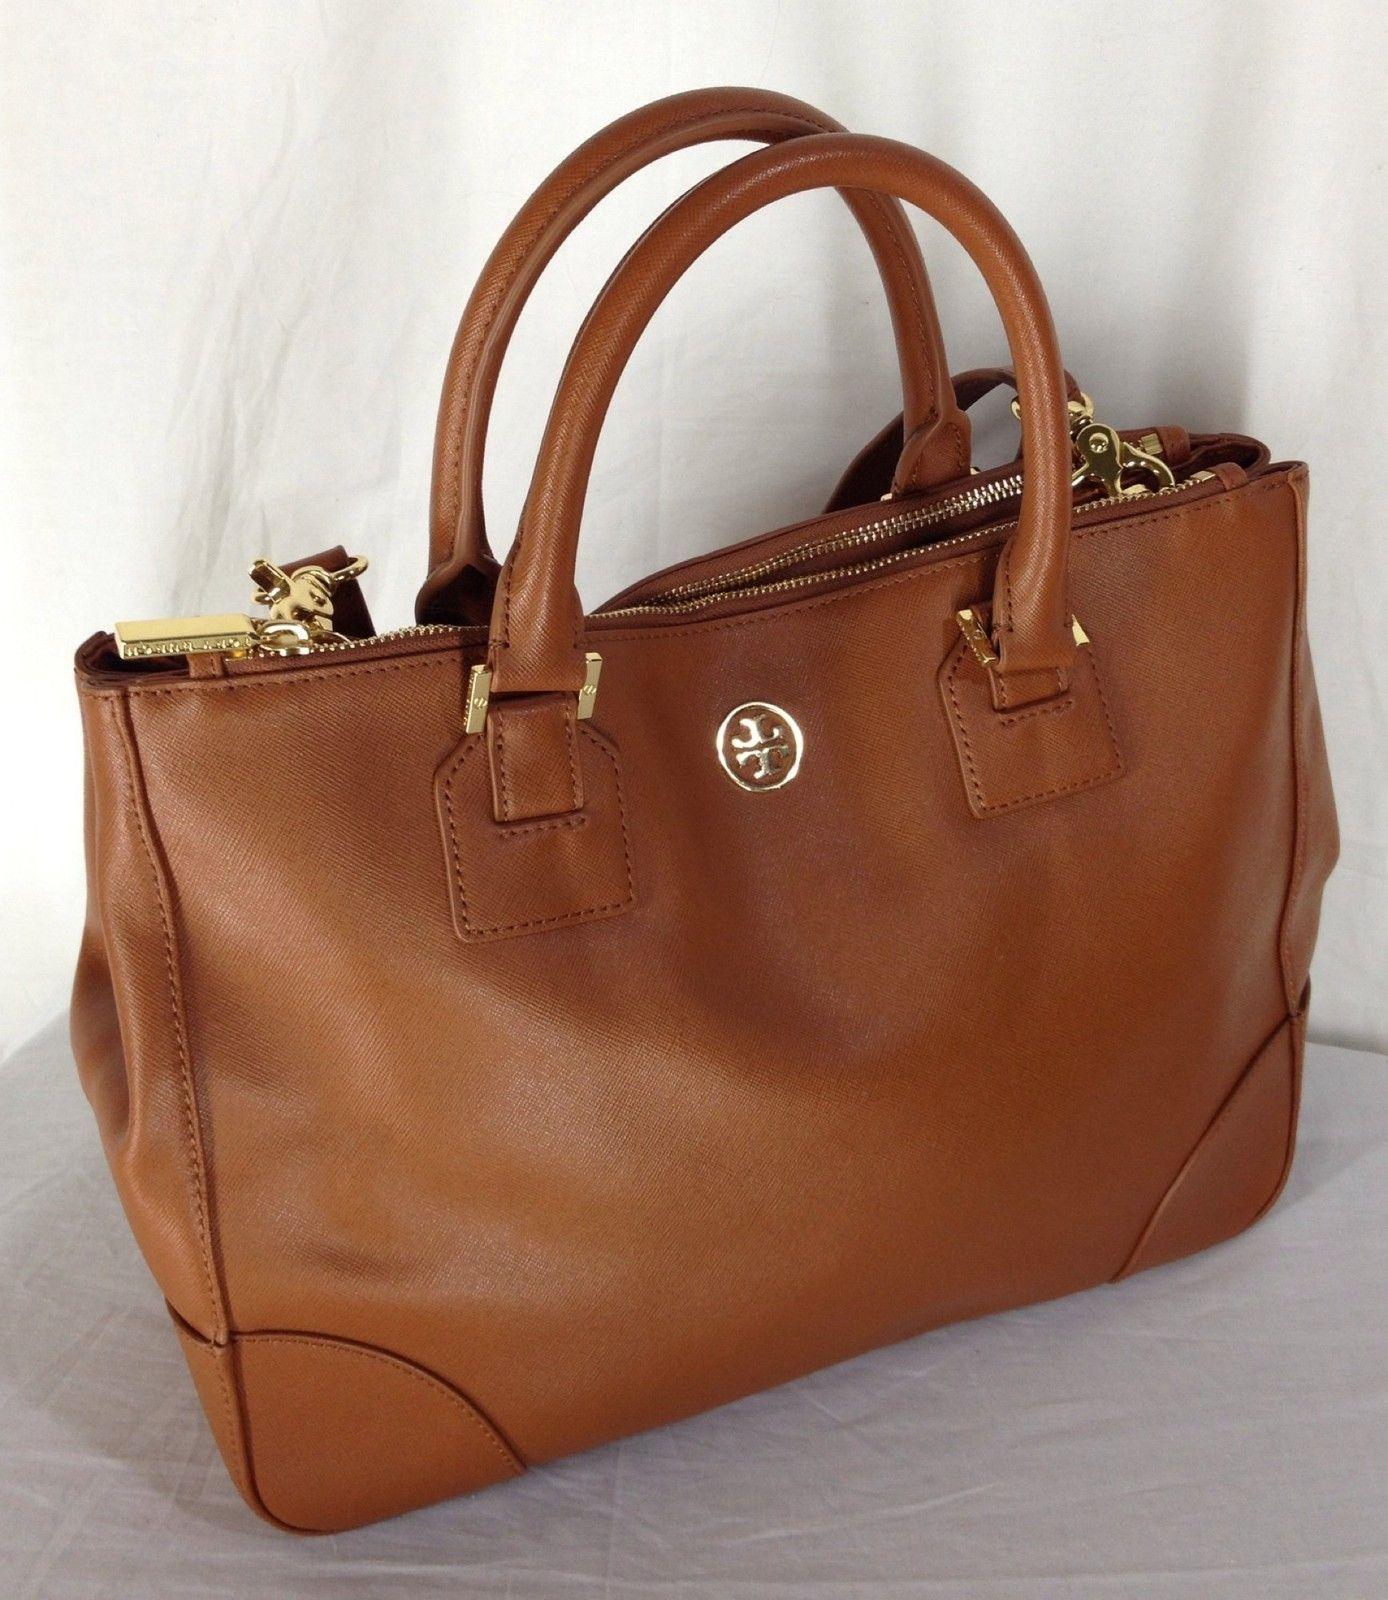 83eb106432 Tory Burch Robinson Double Zip Tote Saffiano Leather Luggage New | eBay